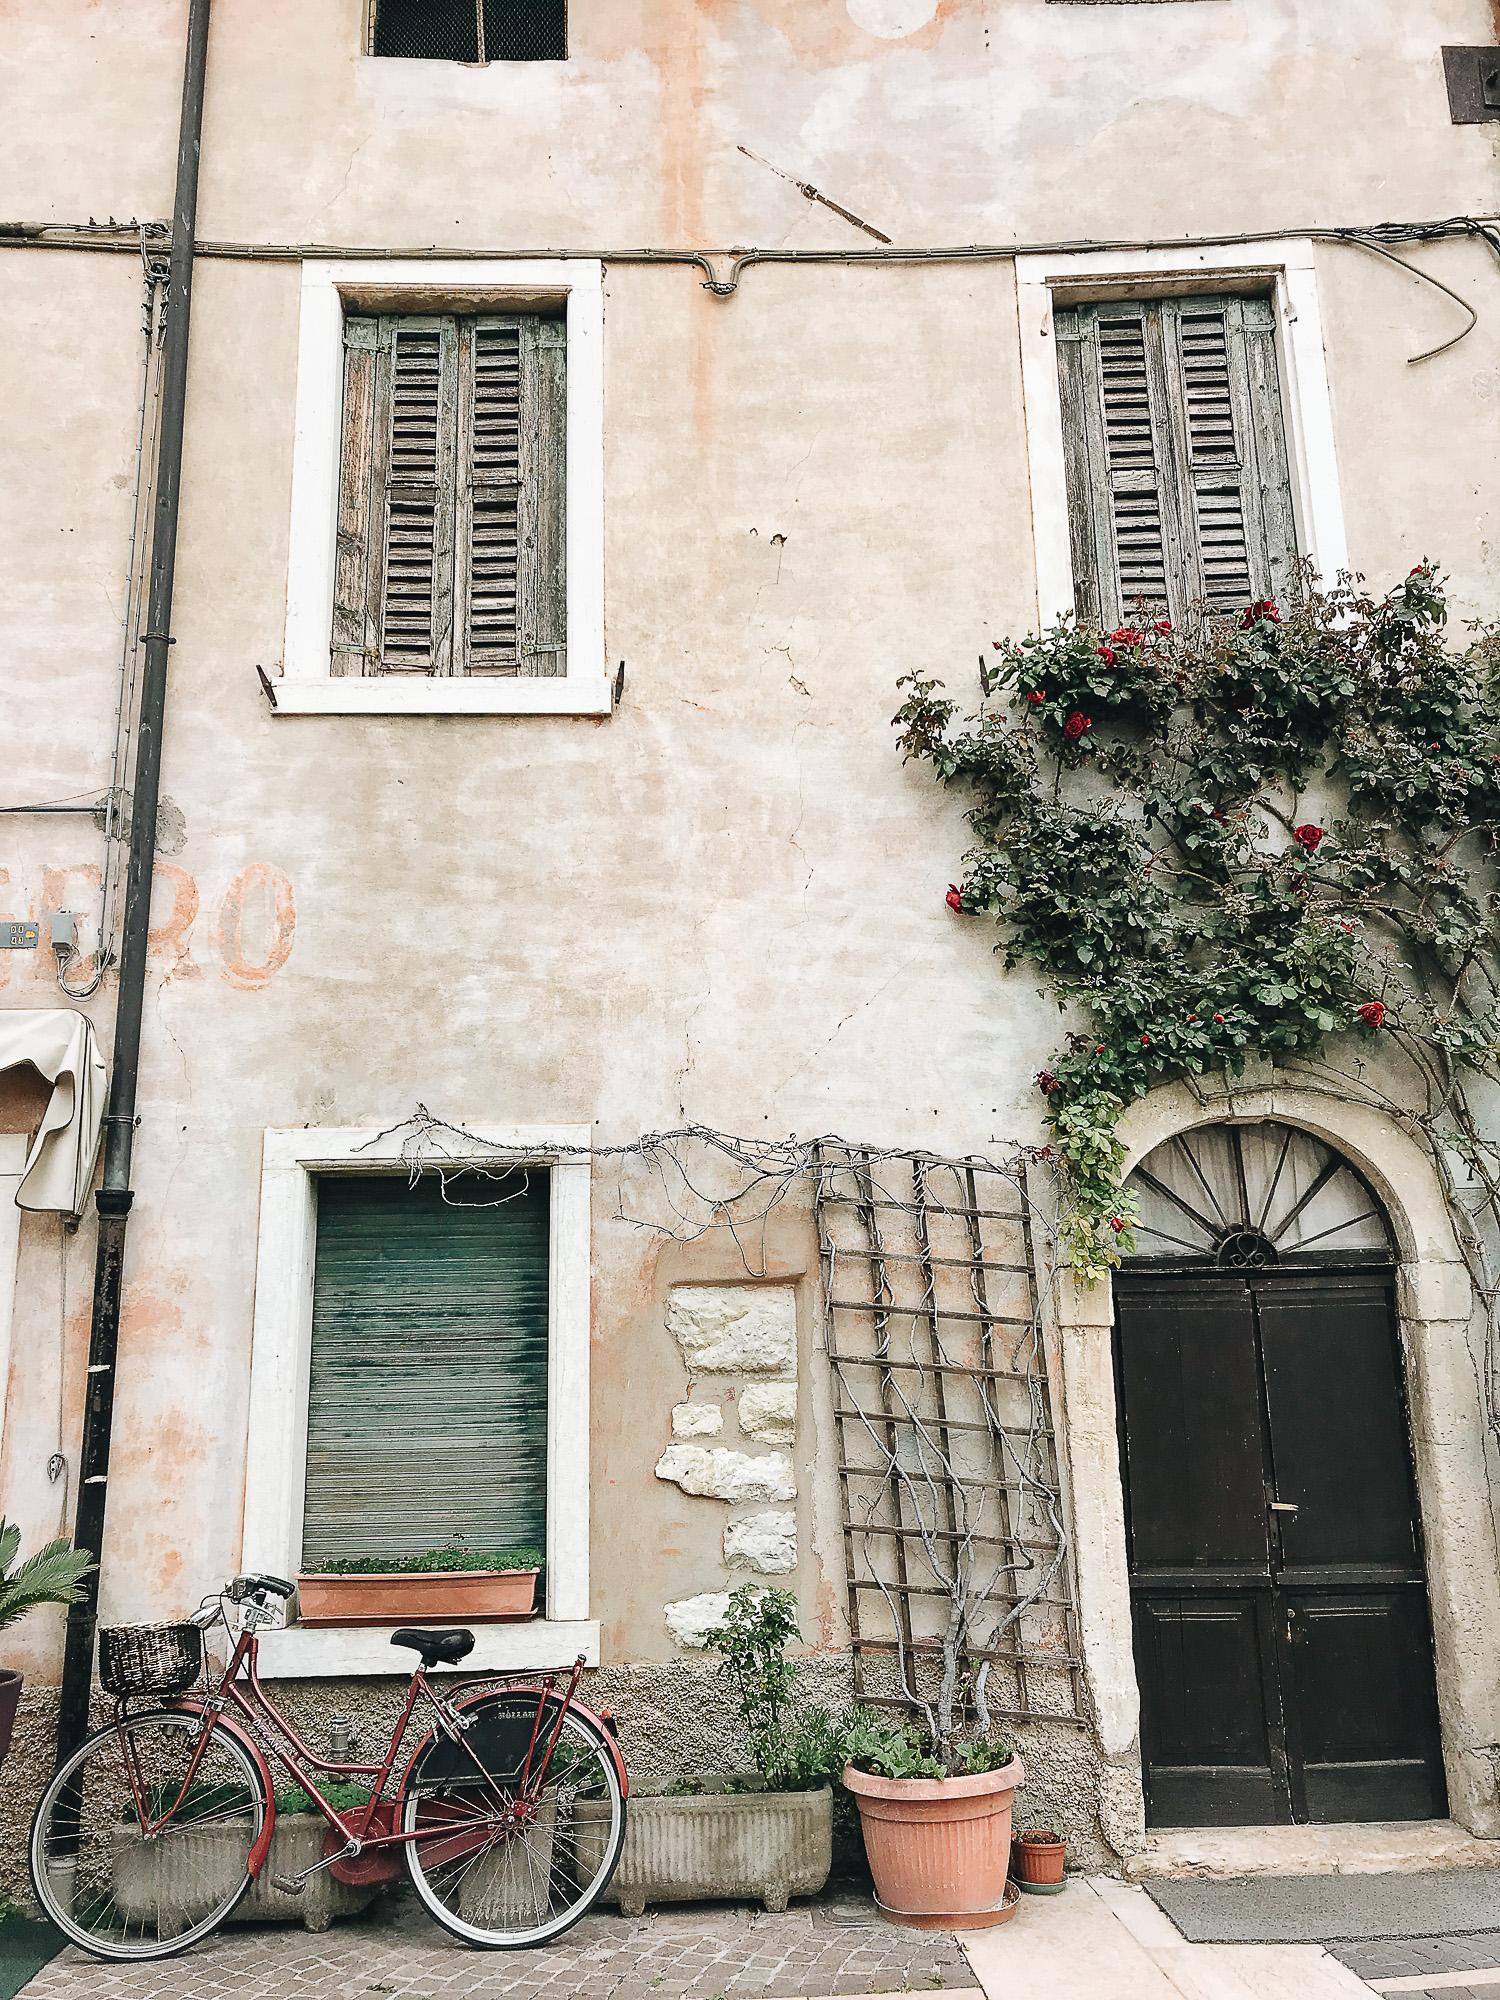 OurBeautifulAdventure-LakeGarda-Italy-Blog-6427.jpg